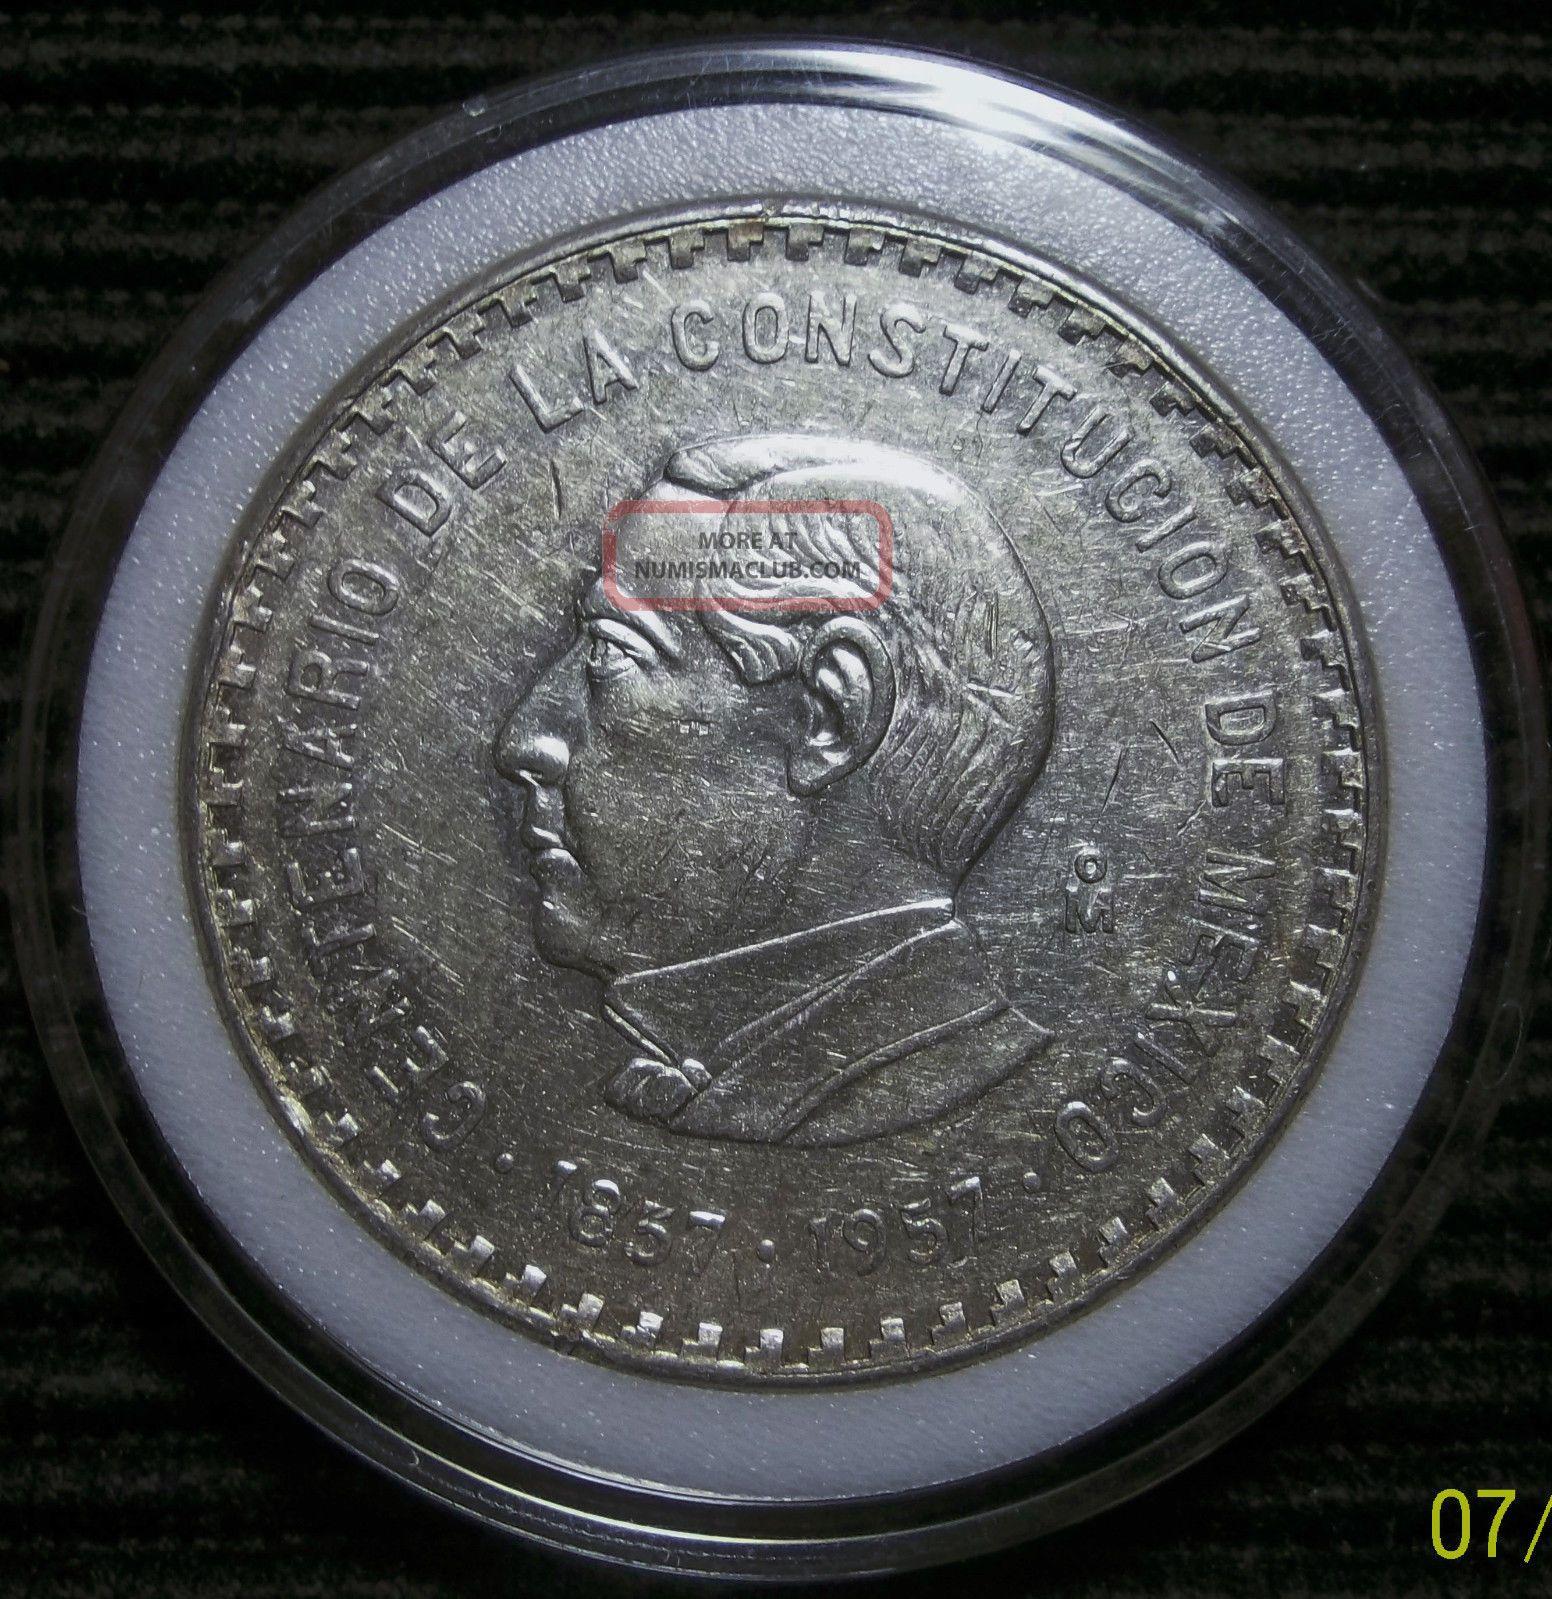 Mexico 1957 Juarez Silver Crown - Diez (10) Pesos Ley.  900 Mexico photo